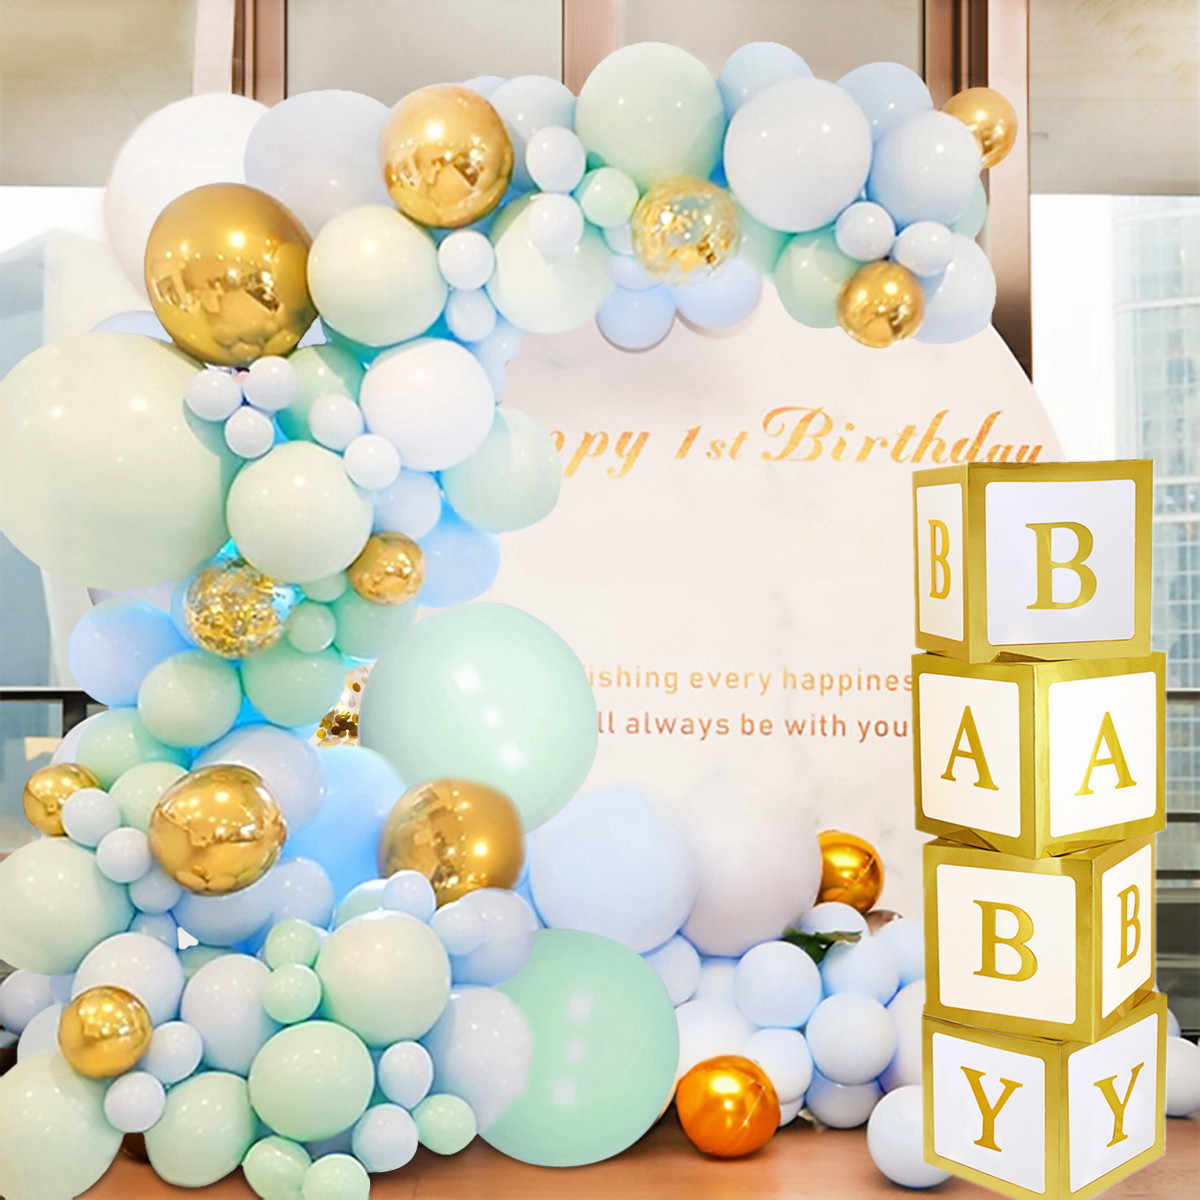 Baby Shower Boy Decoracion.Baby Shower Boy Girl Transparent Box Baby Shower Decoration Baby Christening Birthday Party Decor Cardboard Box Baby Shower Gift